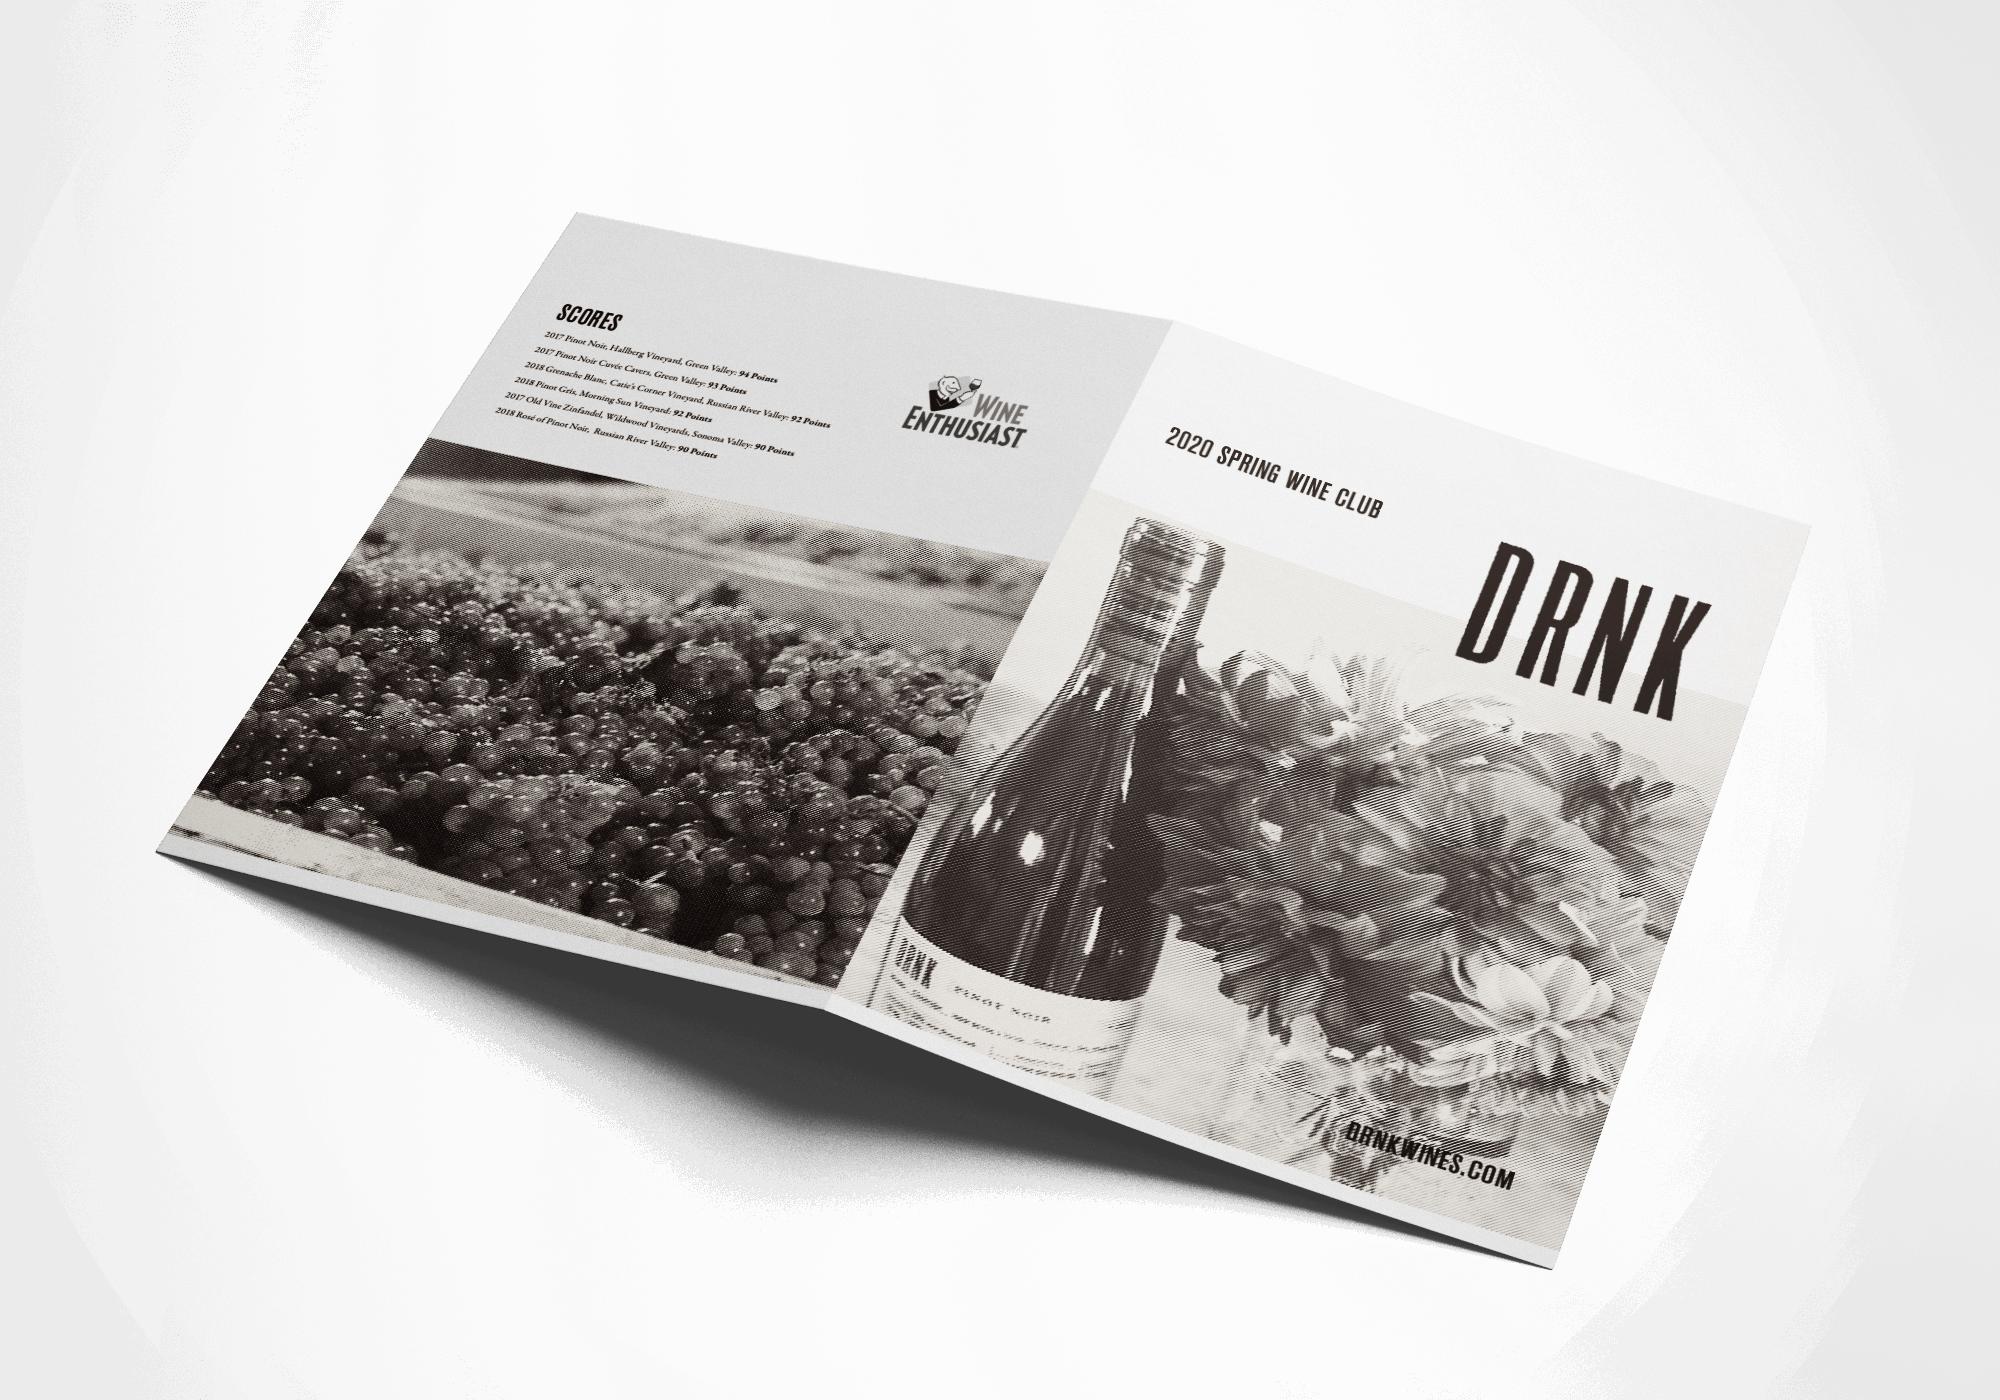 DRNK Wine Club Brochure